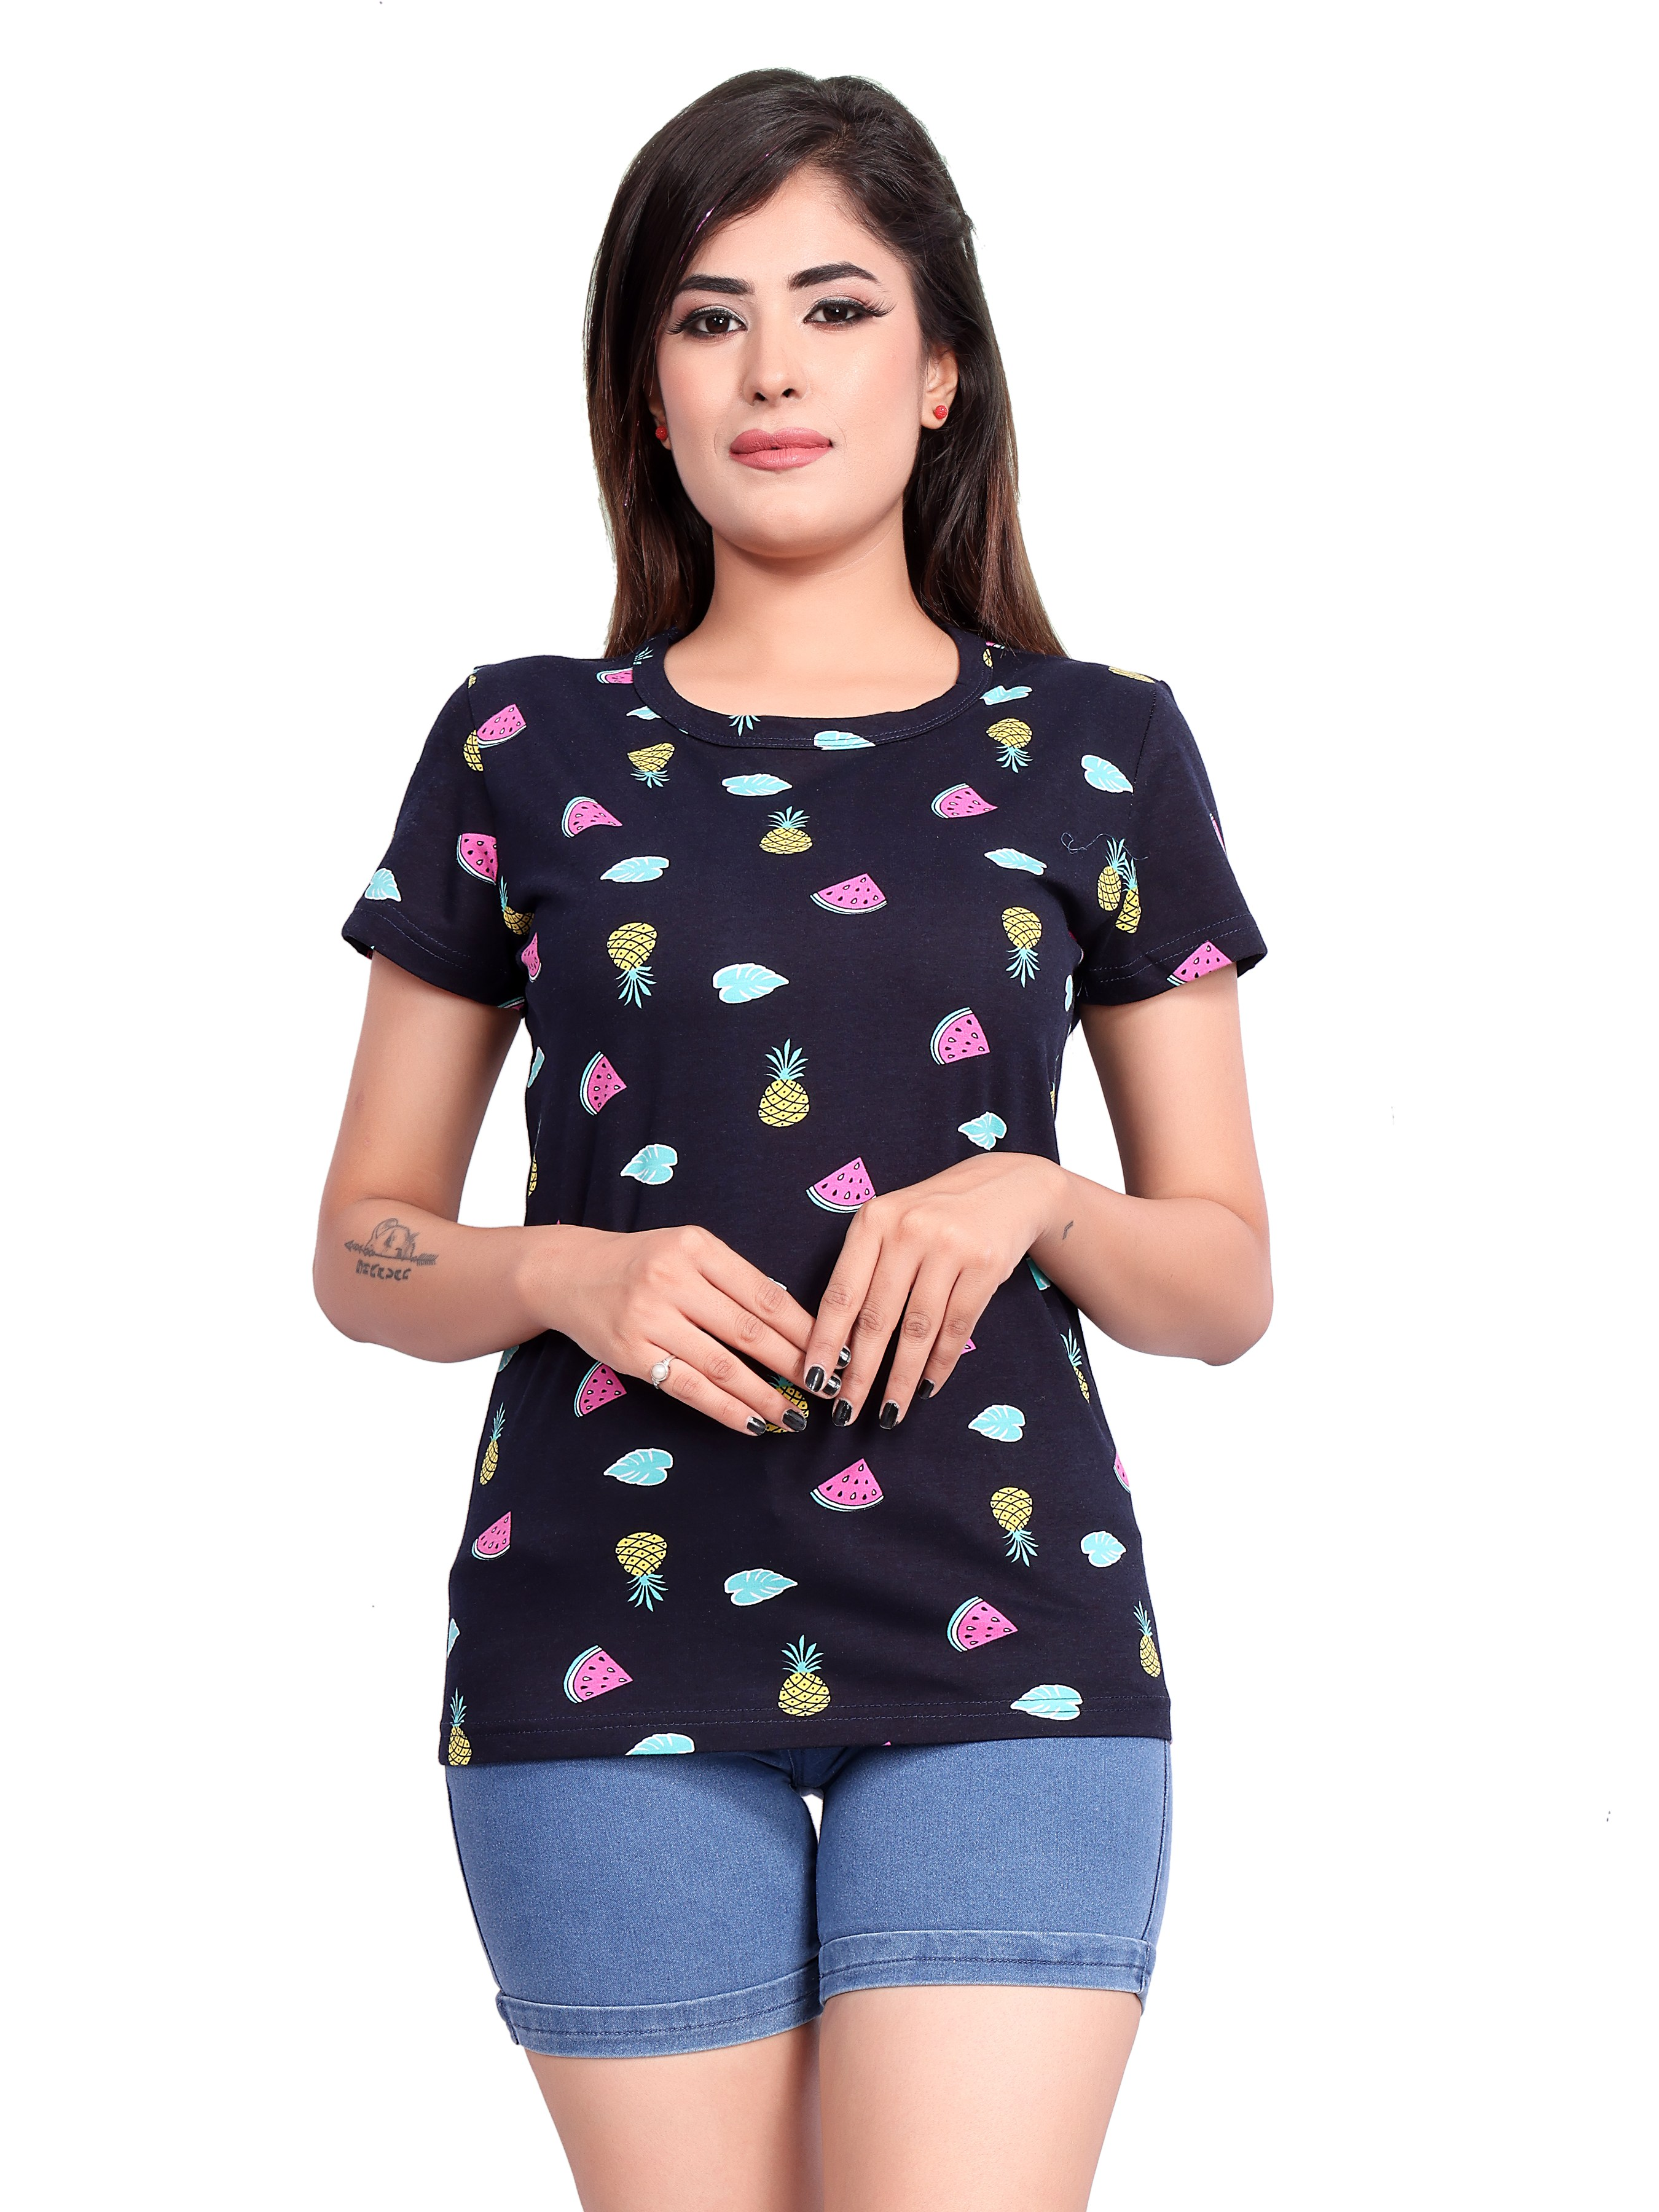 Impex | Impex Women's Cotton Hosiery printed Tshirt